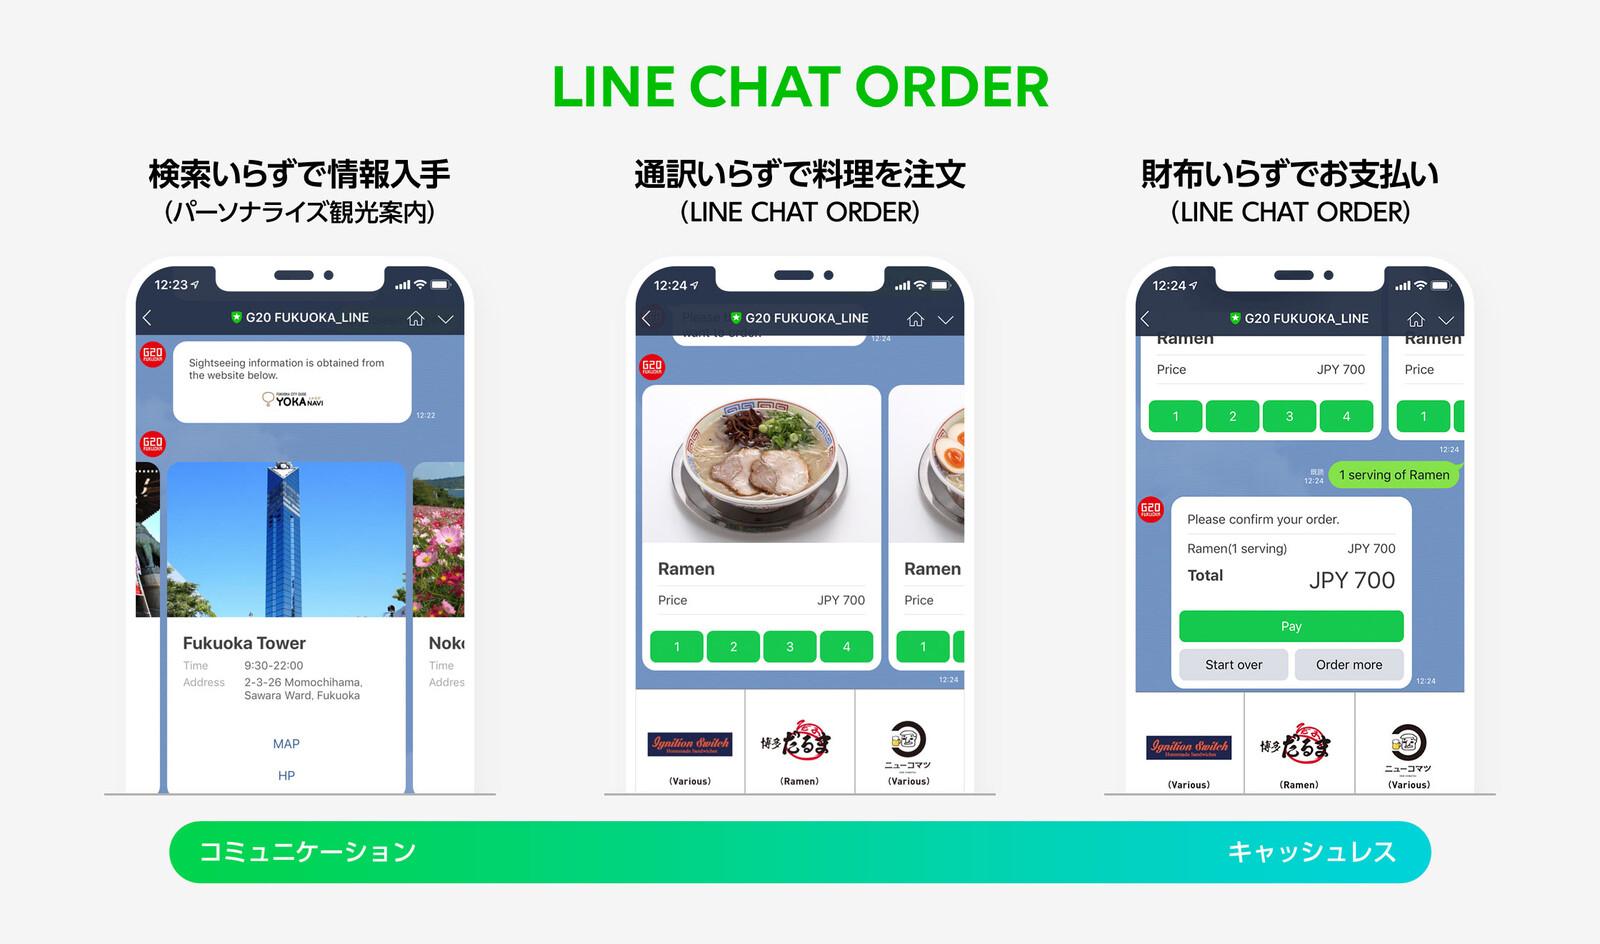 LCO_日本語